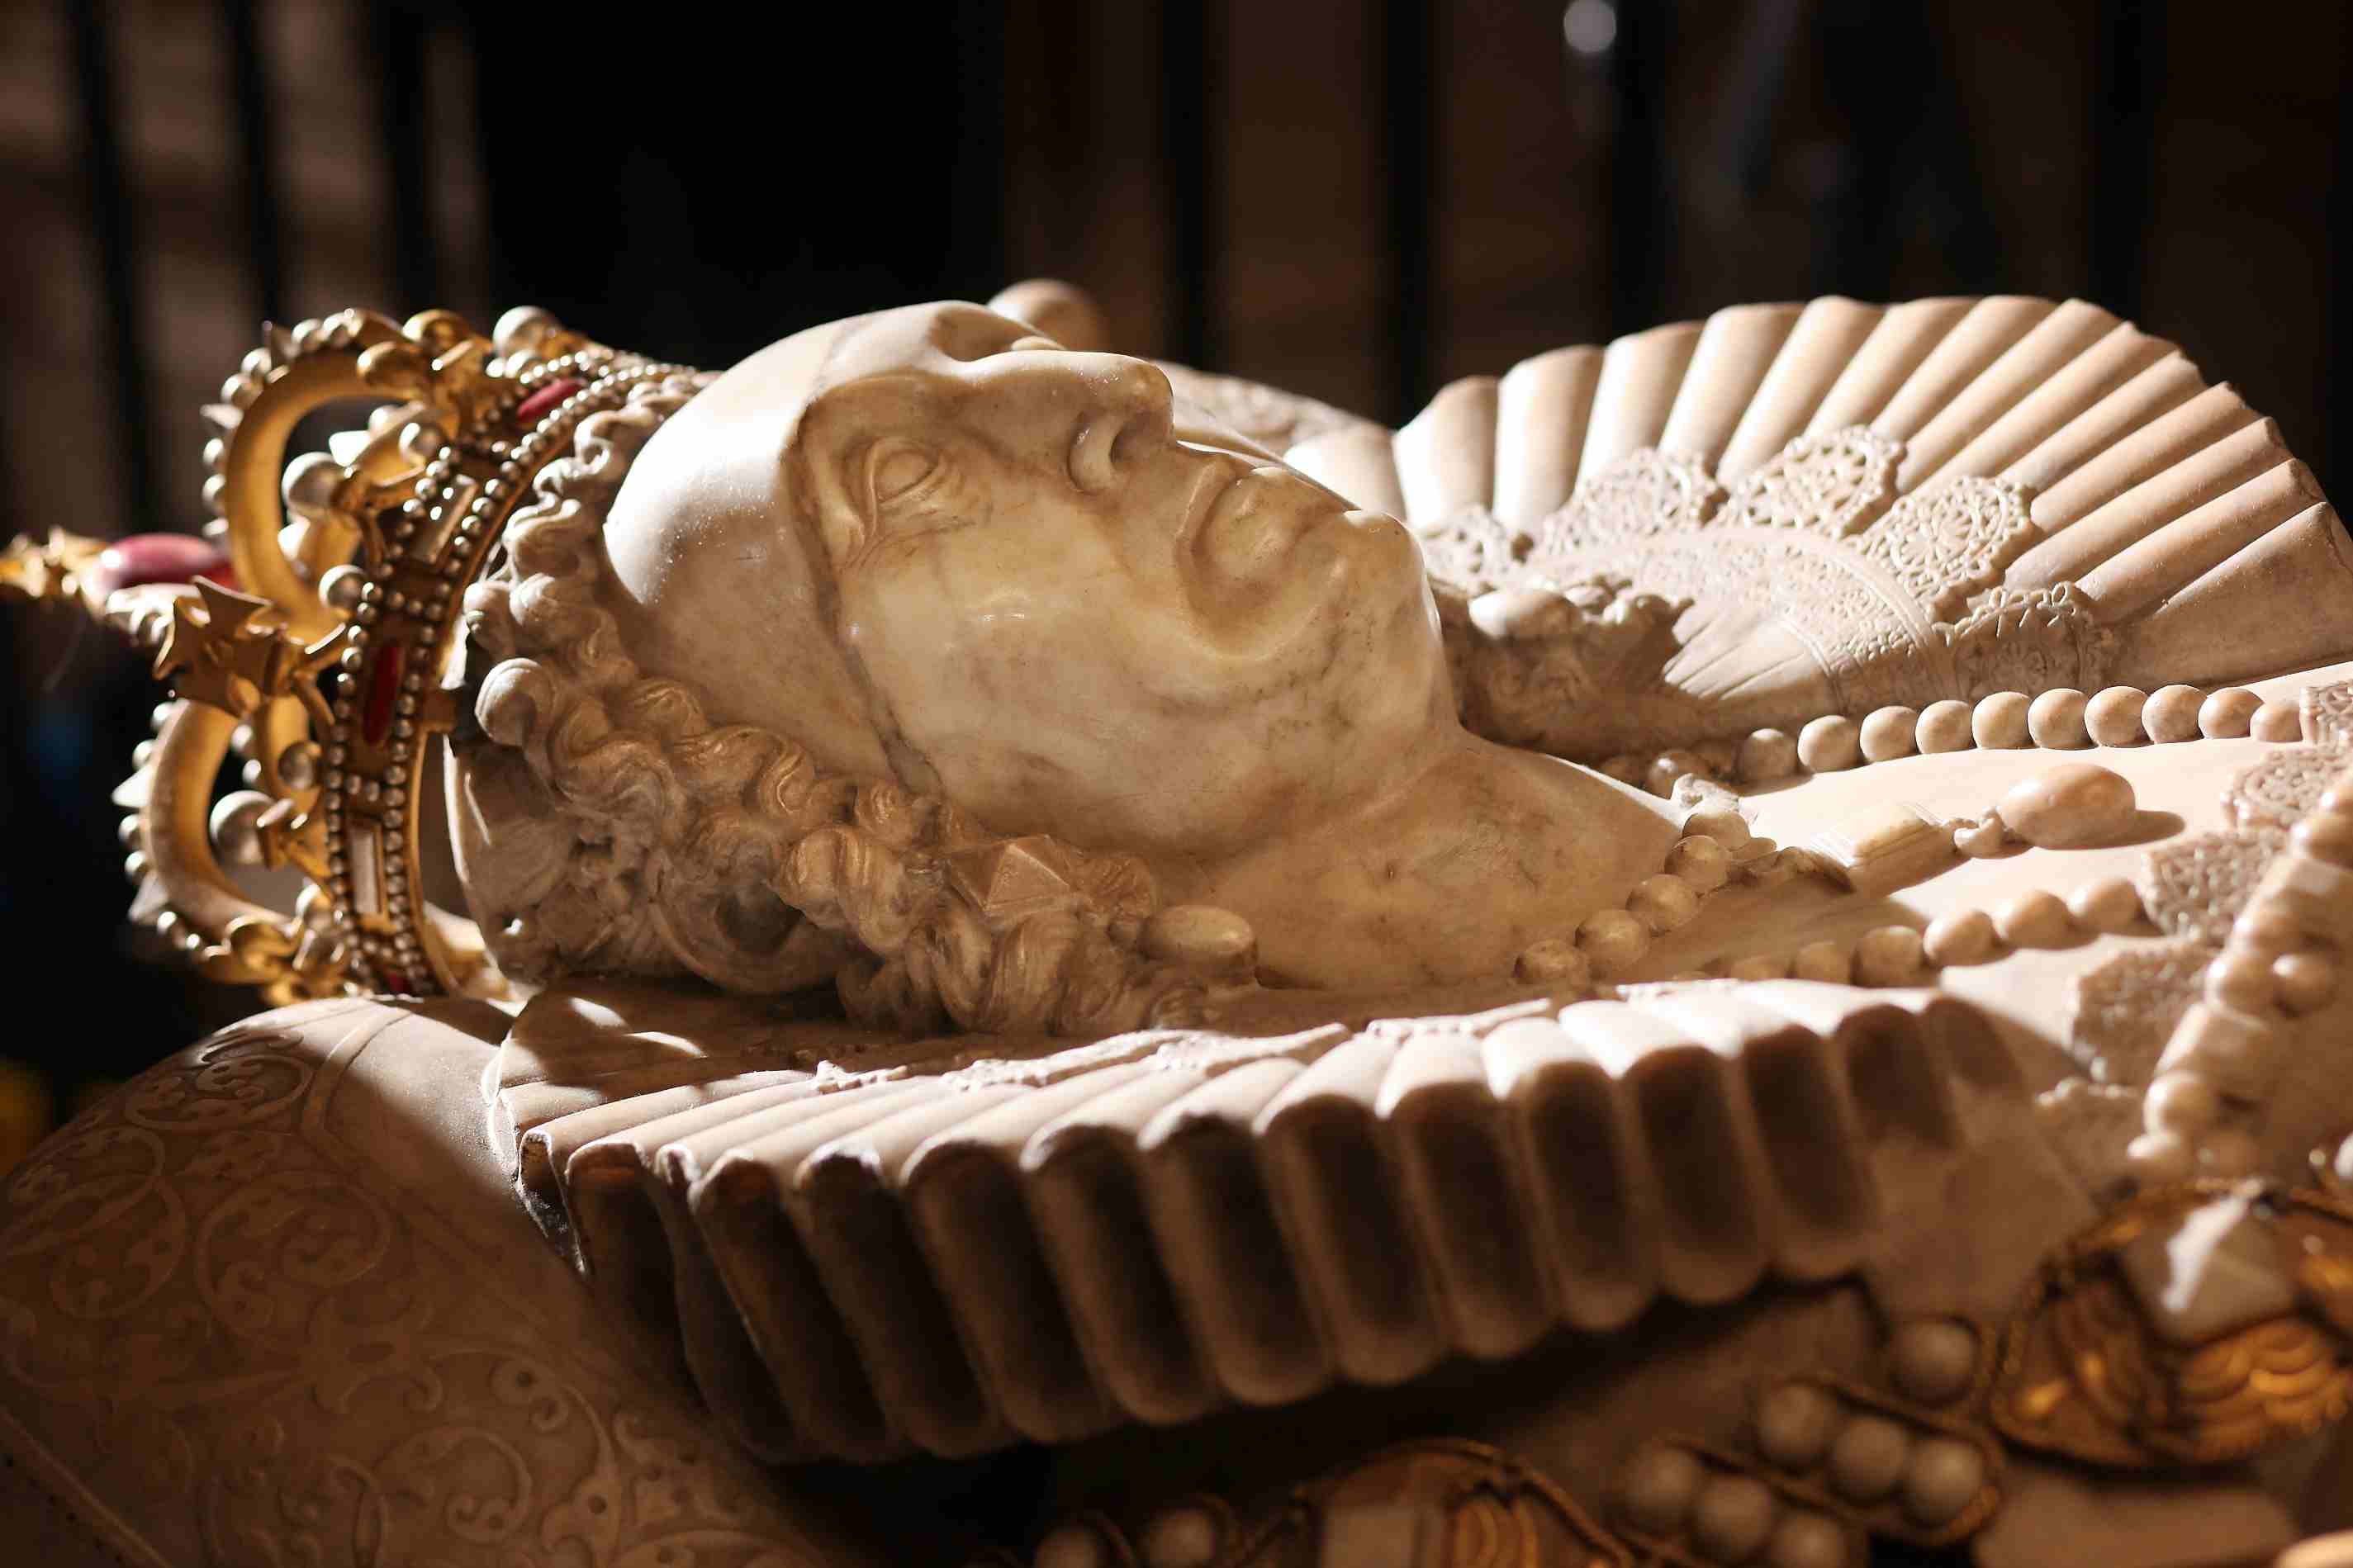 Tomb of Queen Elizabeth I in Westminster Abbey